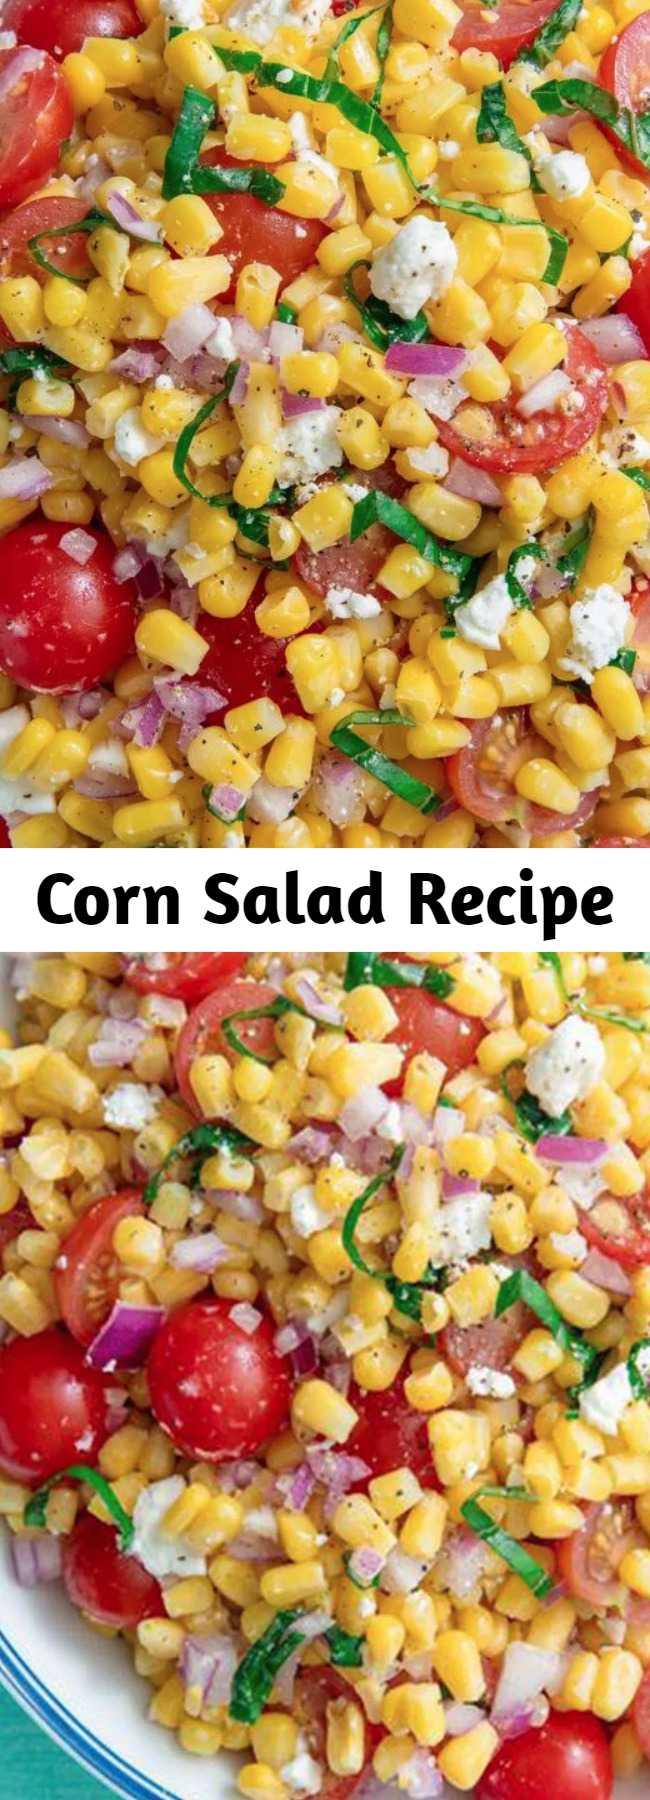 Corn Salad Recipe - Corn Salad makes the perfect summer dish for picnics, potlucks, or BBQs. So easy to make with no cooking involved! #easyrecipe #corn #summer #sidedish #salad